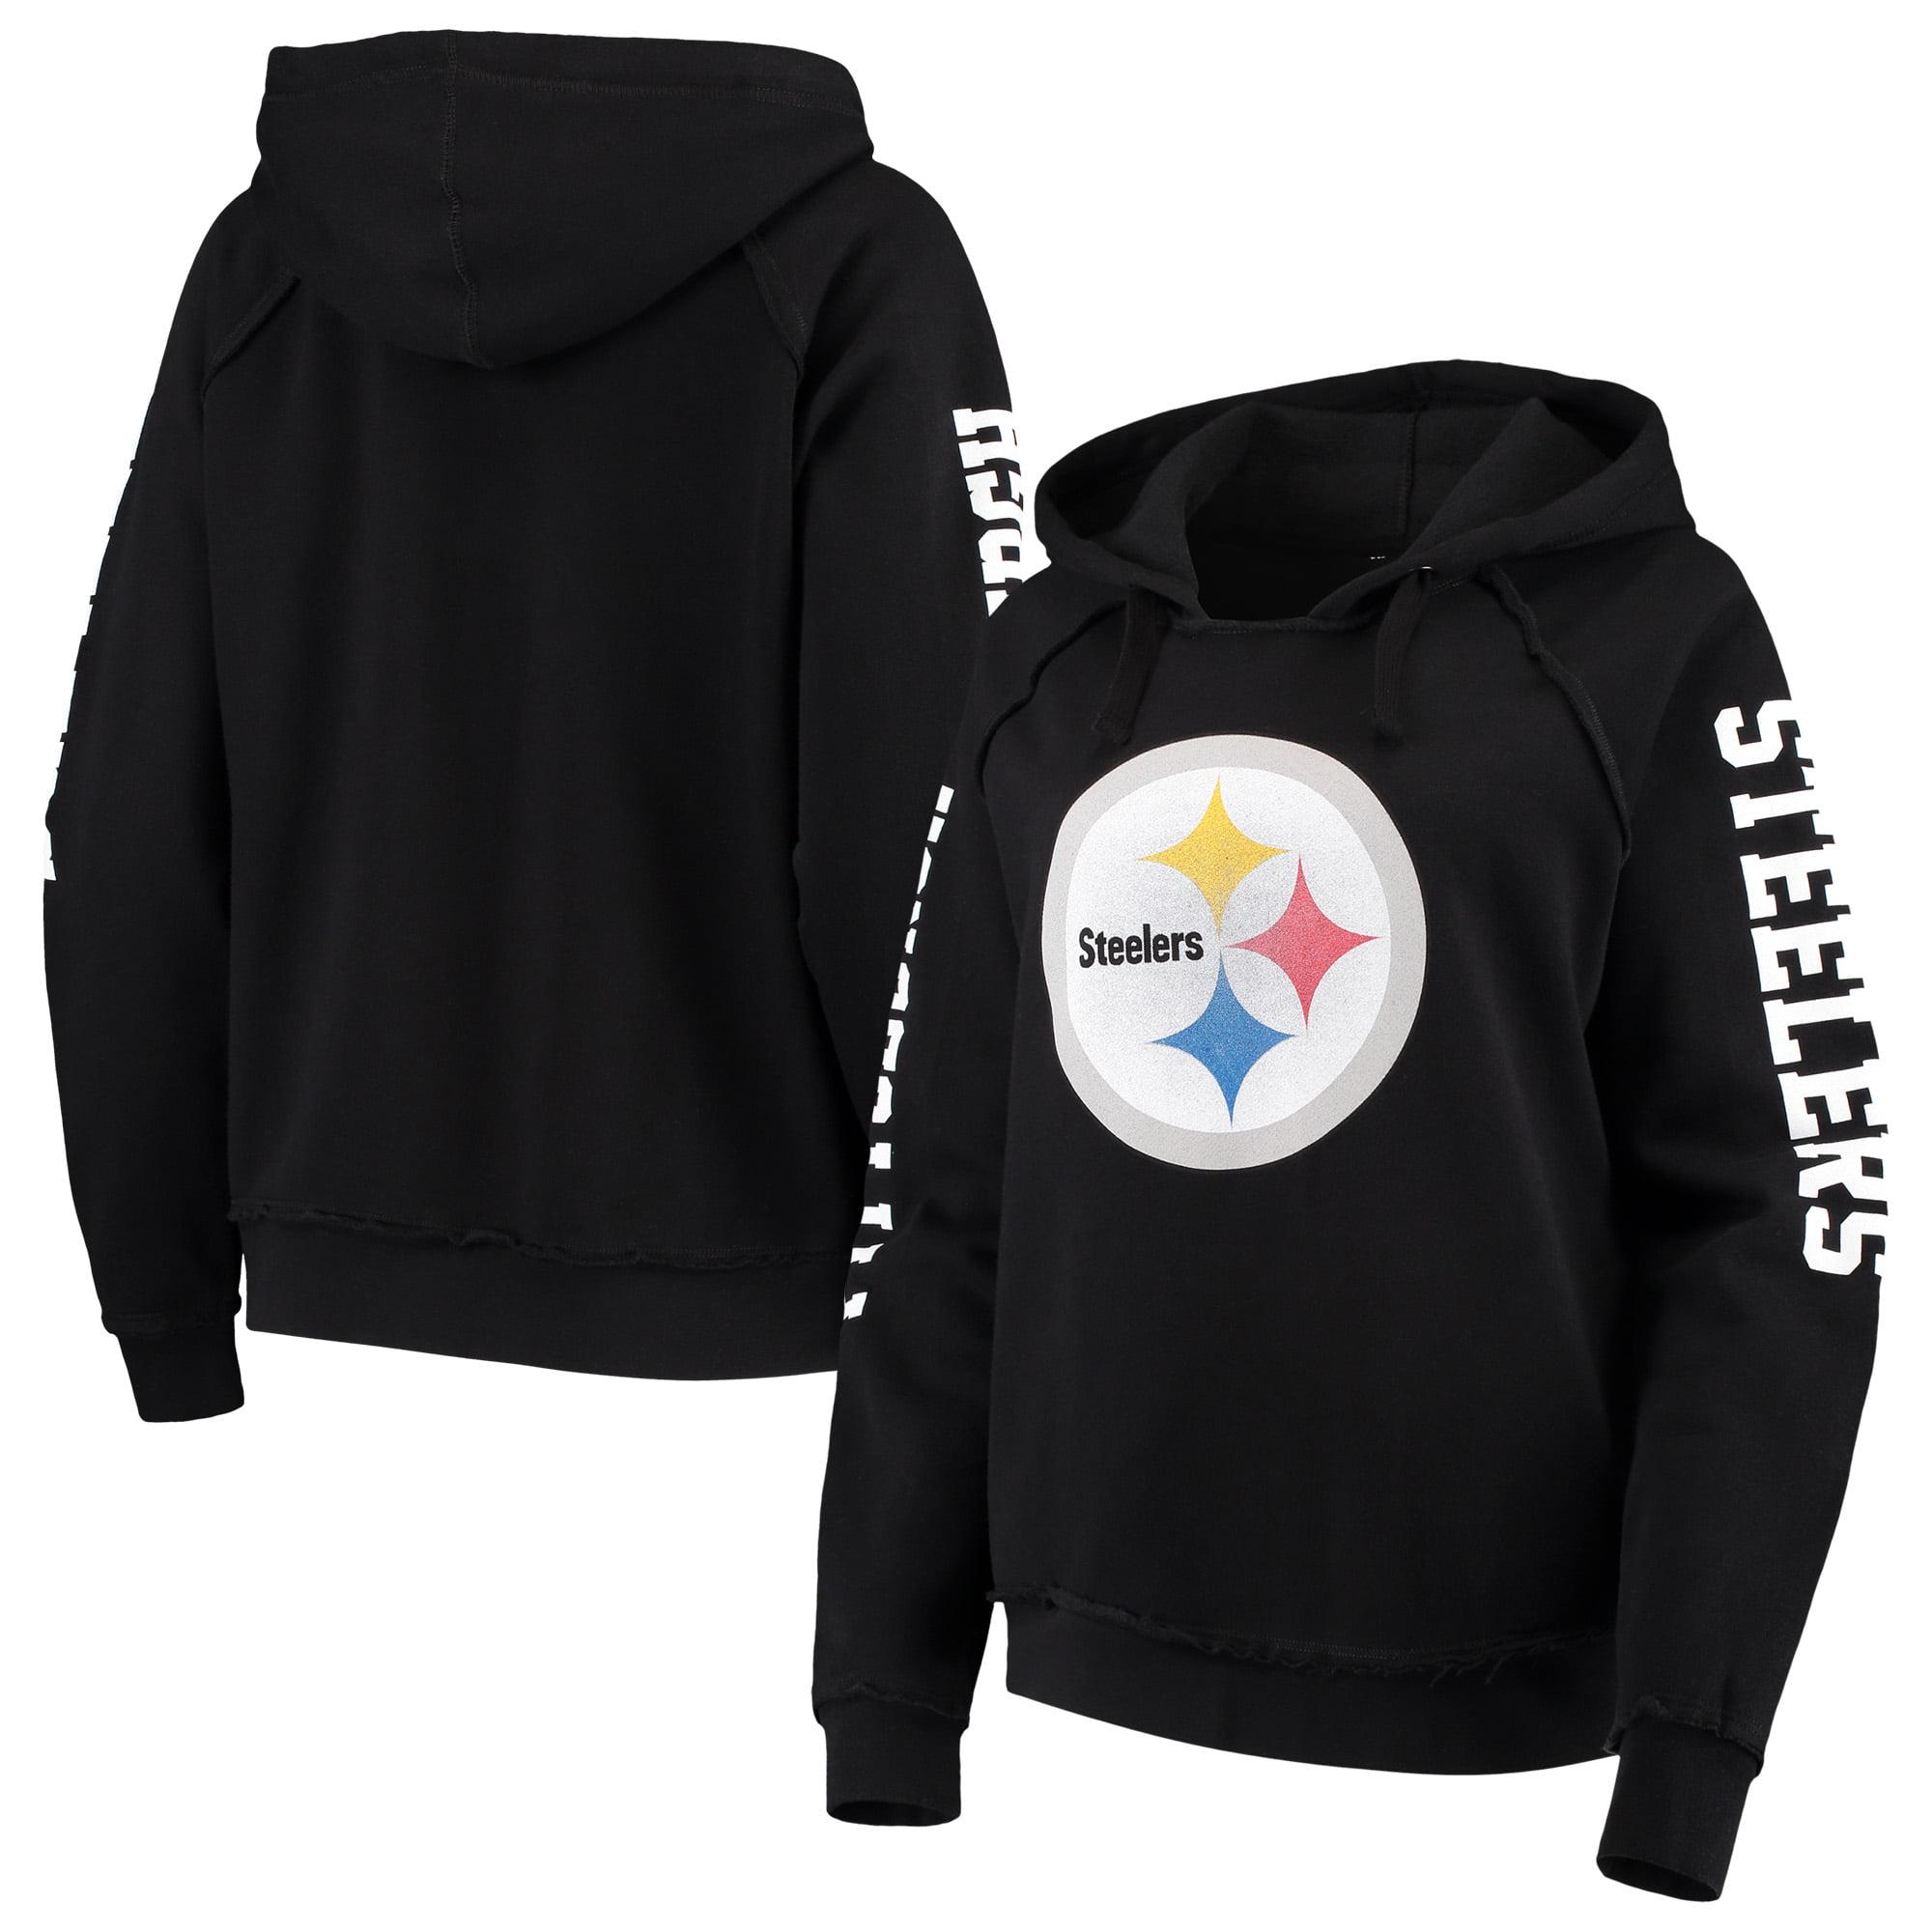 688b38869f2 Pittsburgh Steelers New Era Women s Touchdown Fleece Pullover Hoodie - Black  - Walmart.com